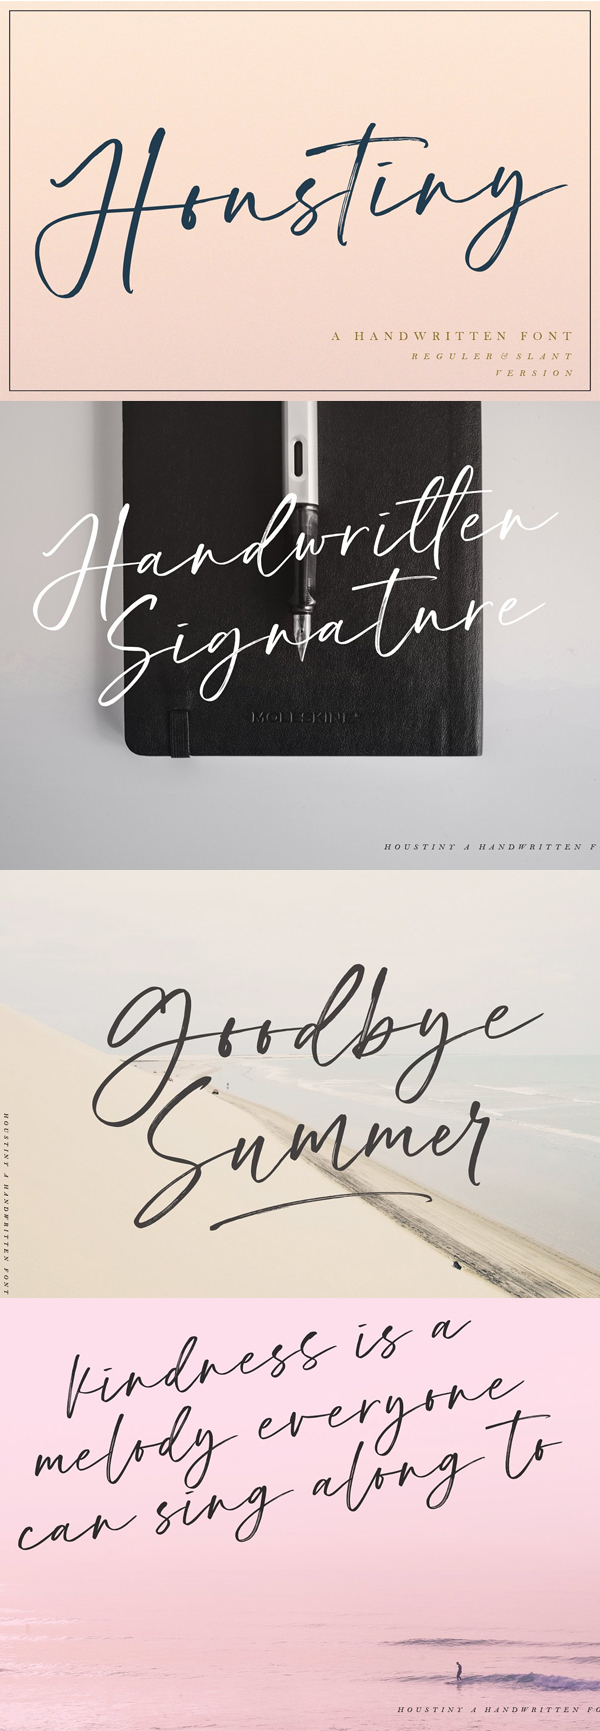 Houstiny Handwritten Free Font